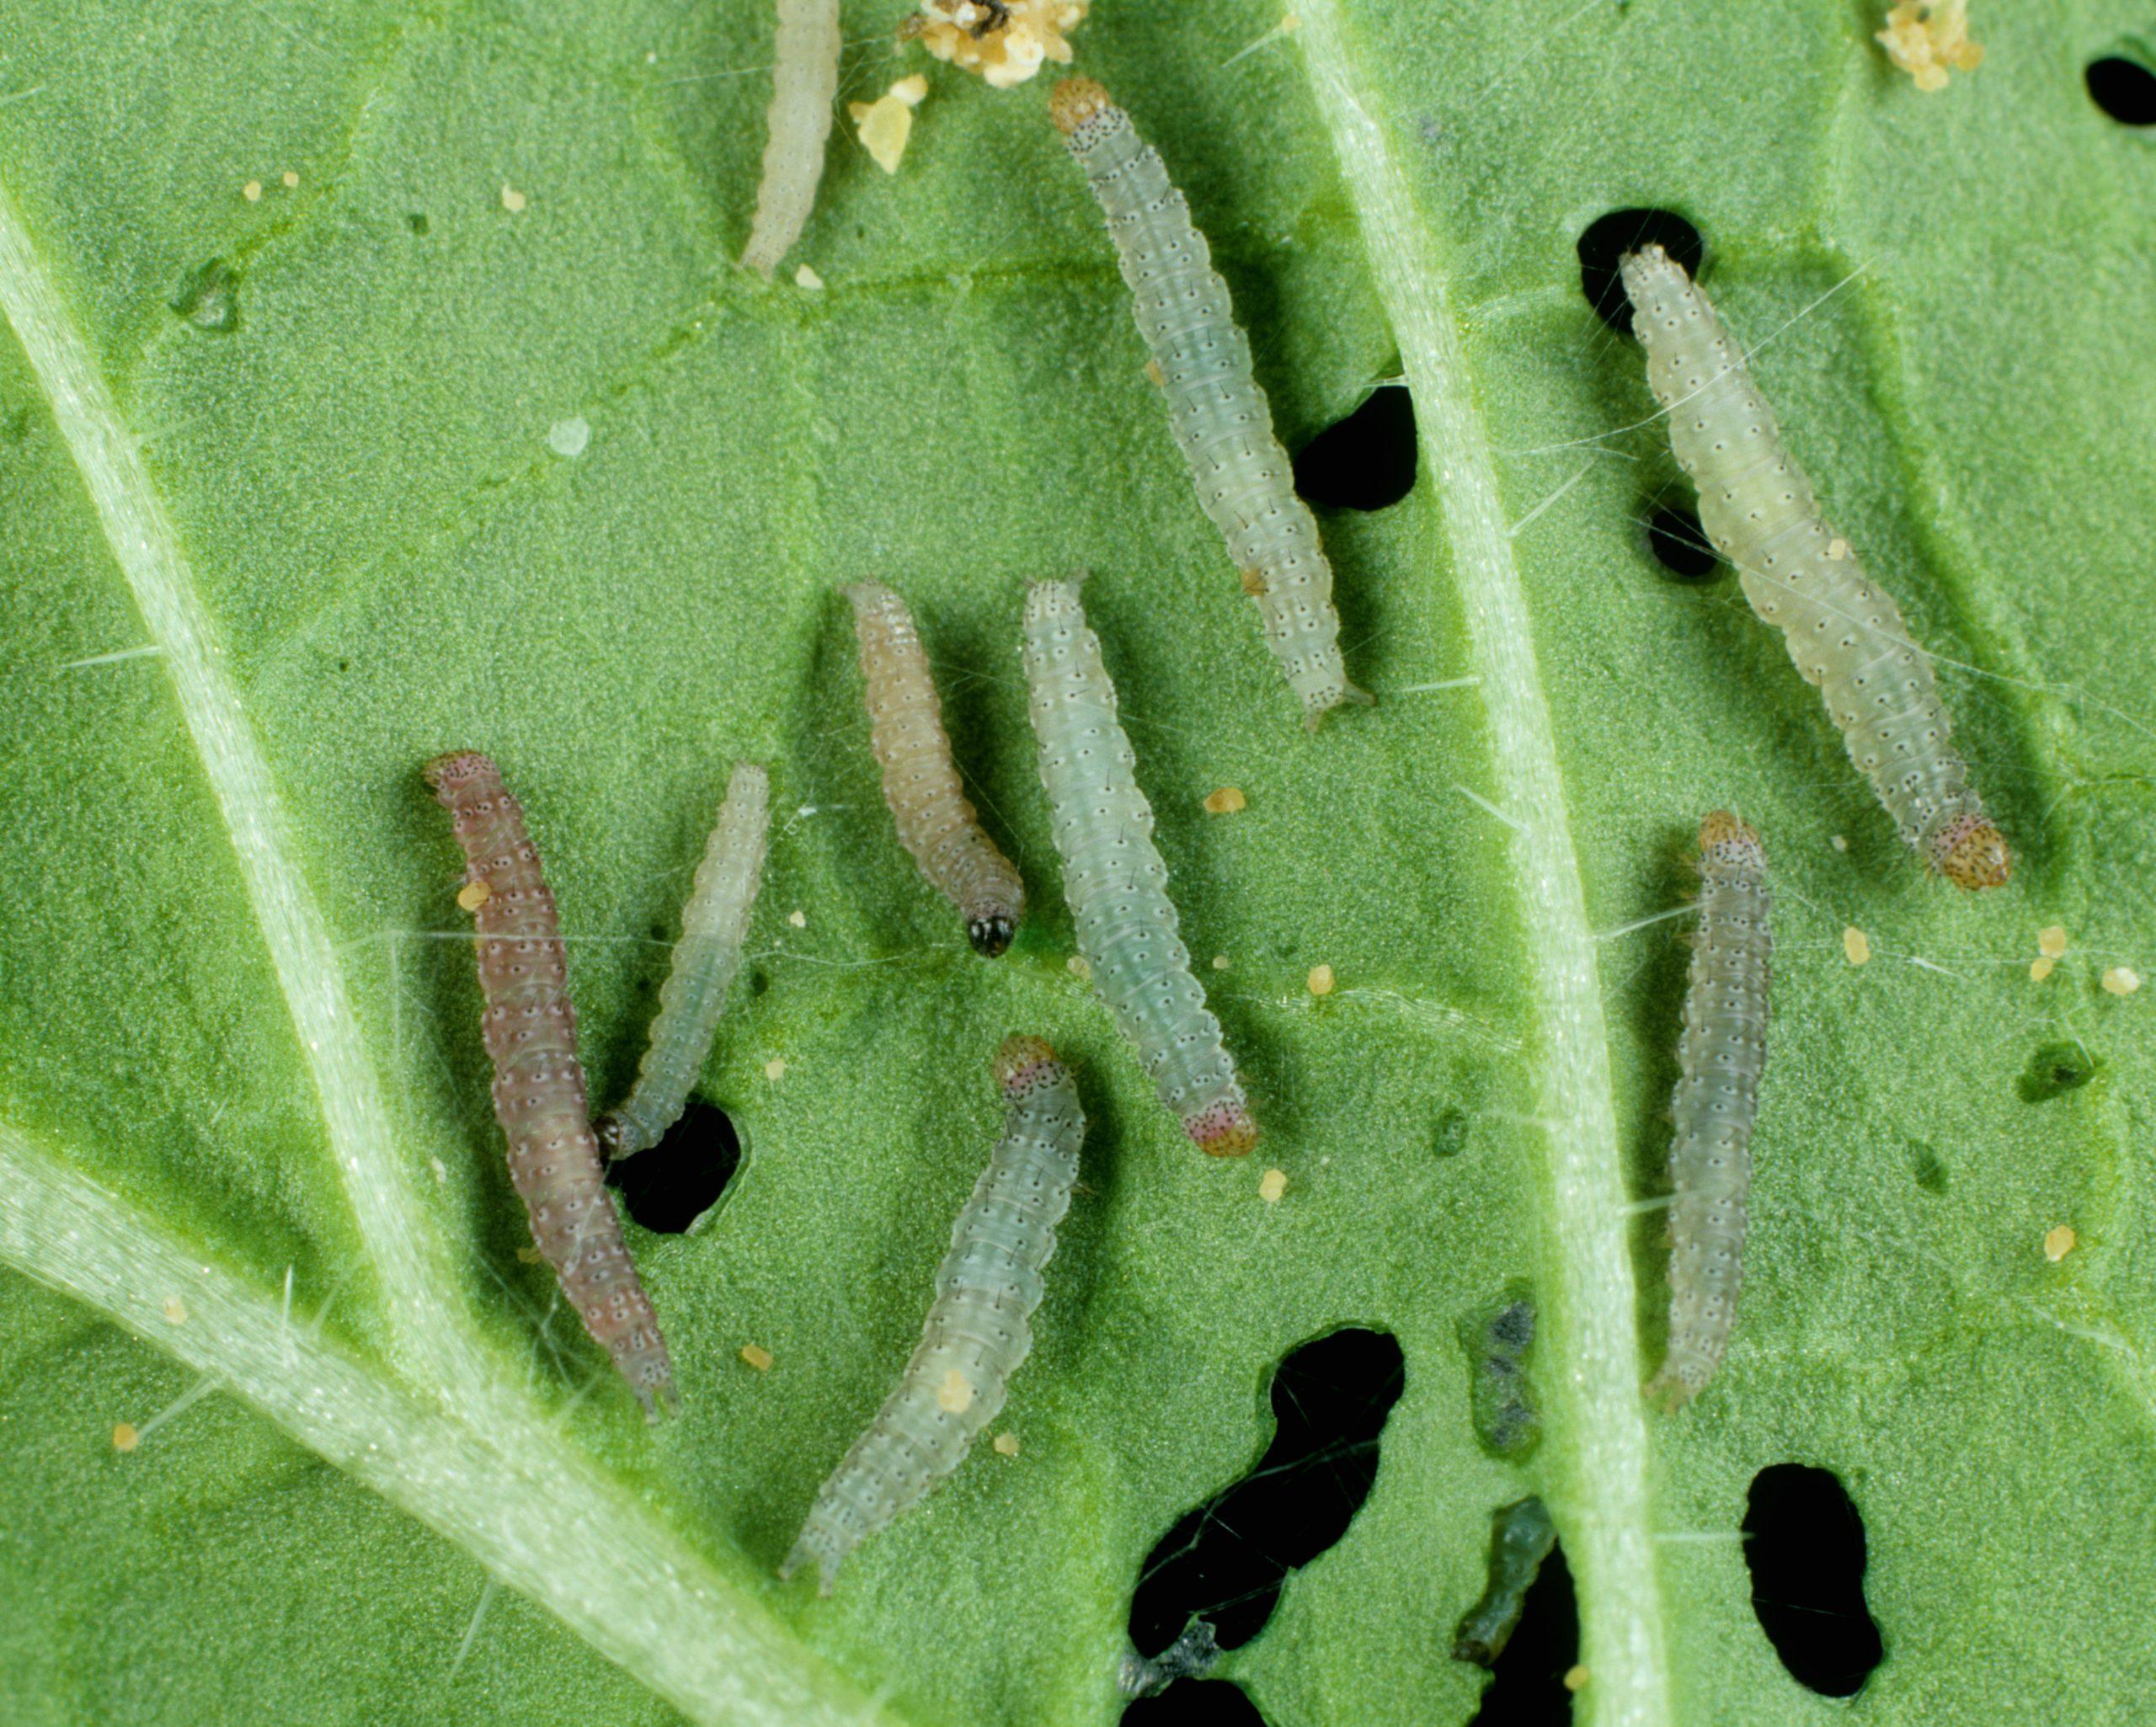 diamondback moth larvae